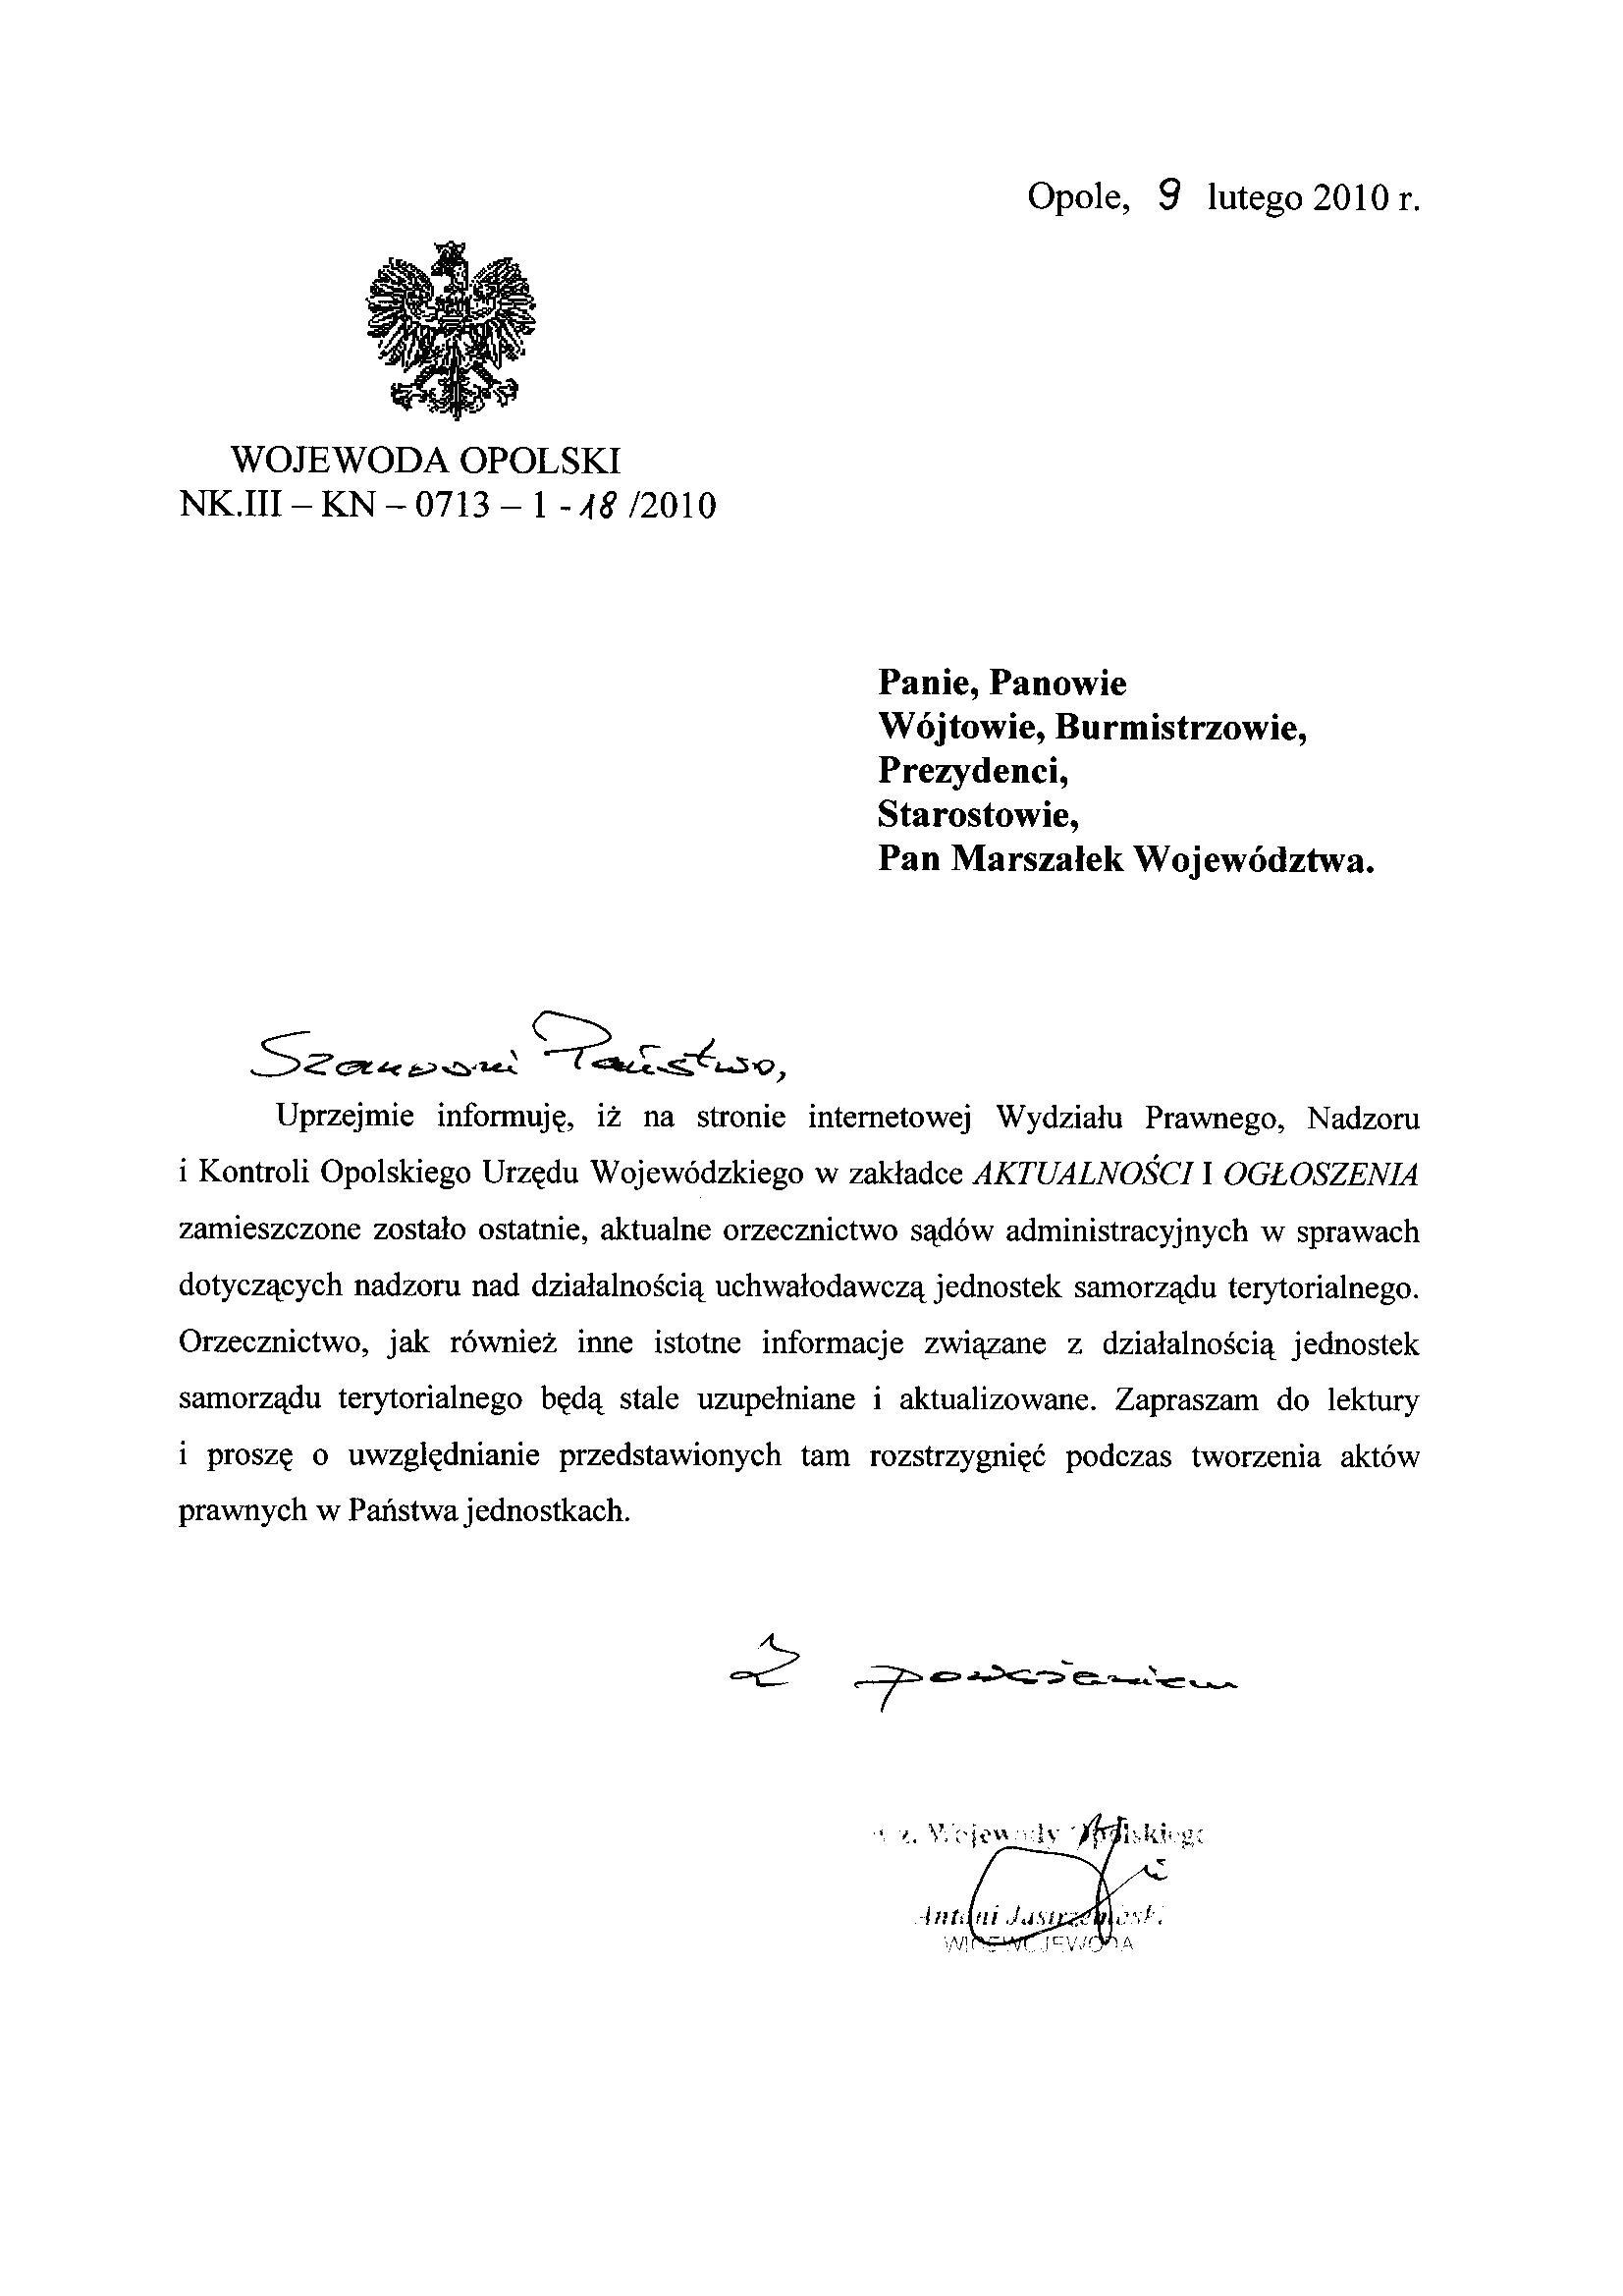 pismo_wojewoda_opolski_09_02_2010.jpeg